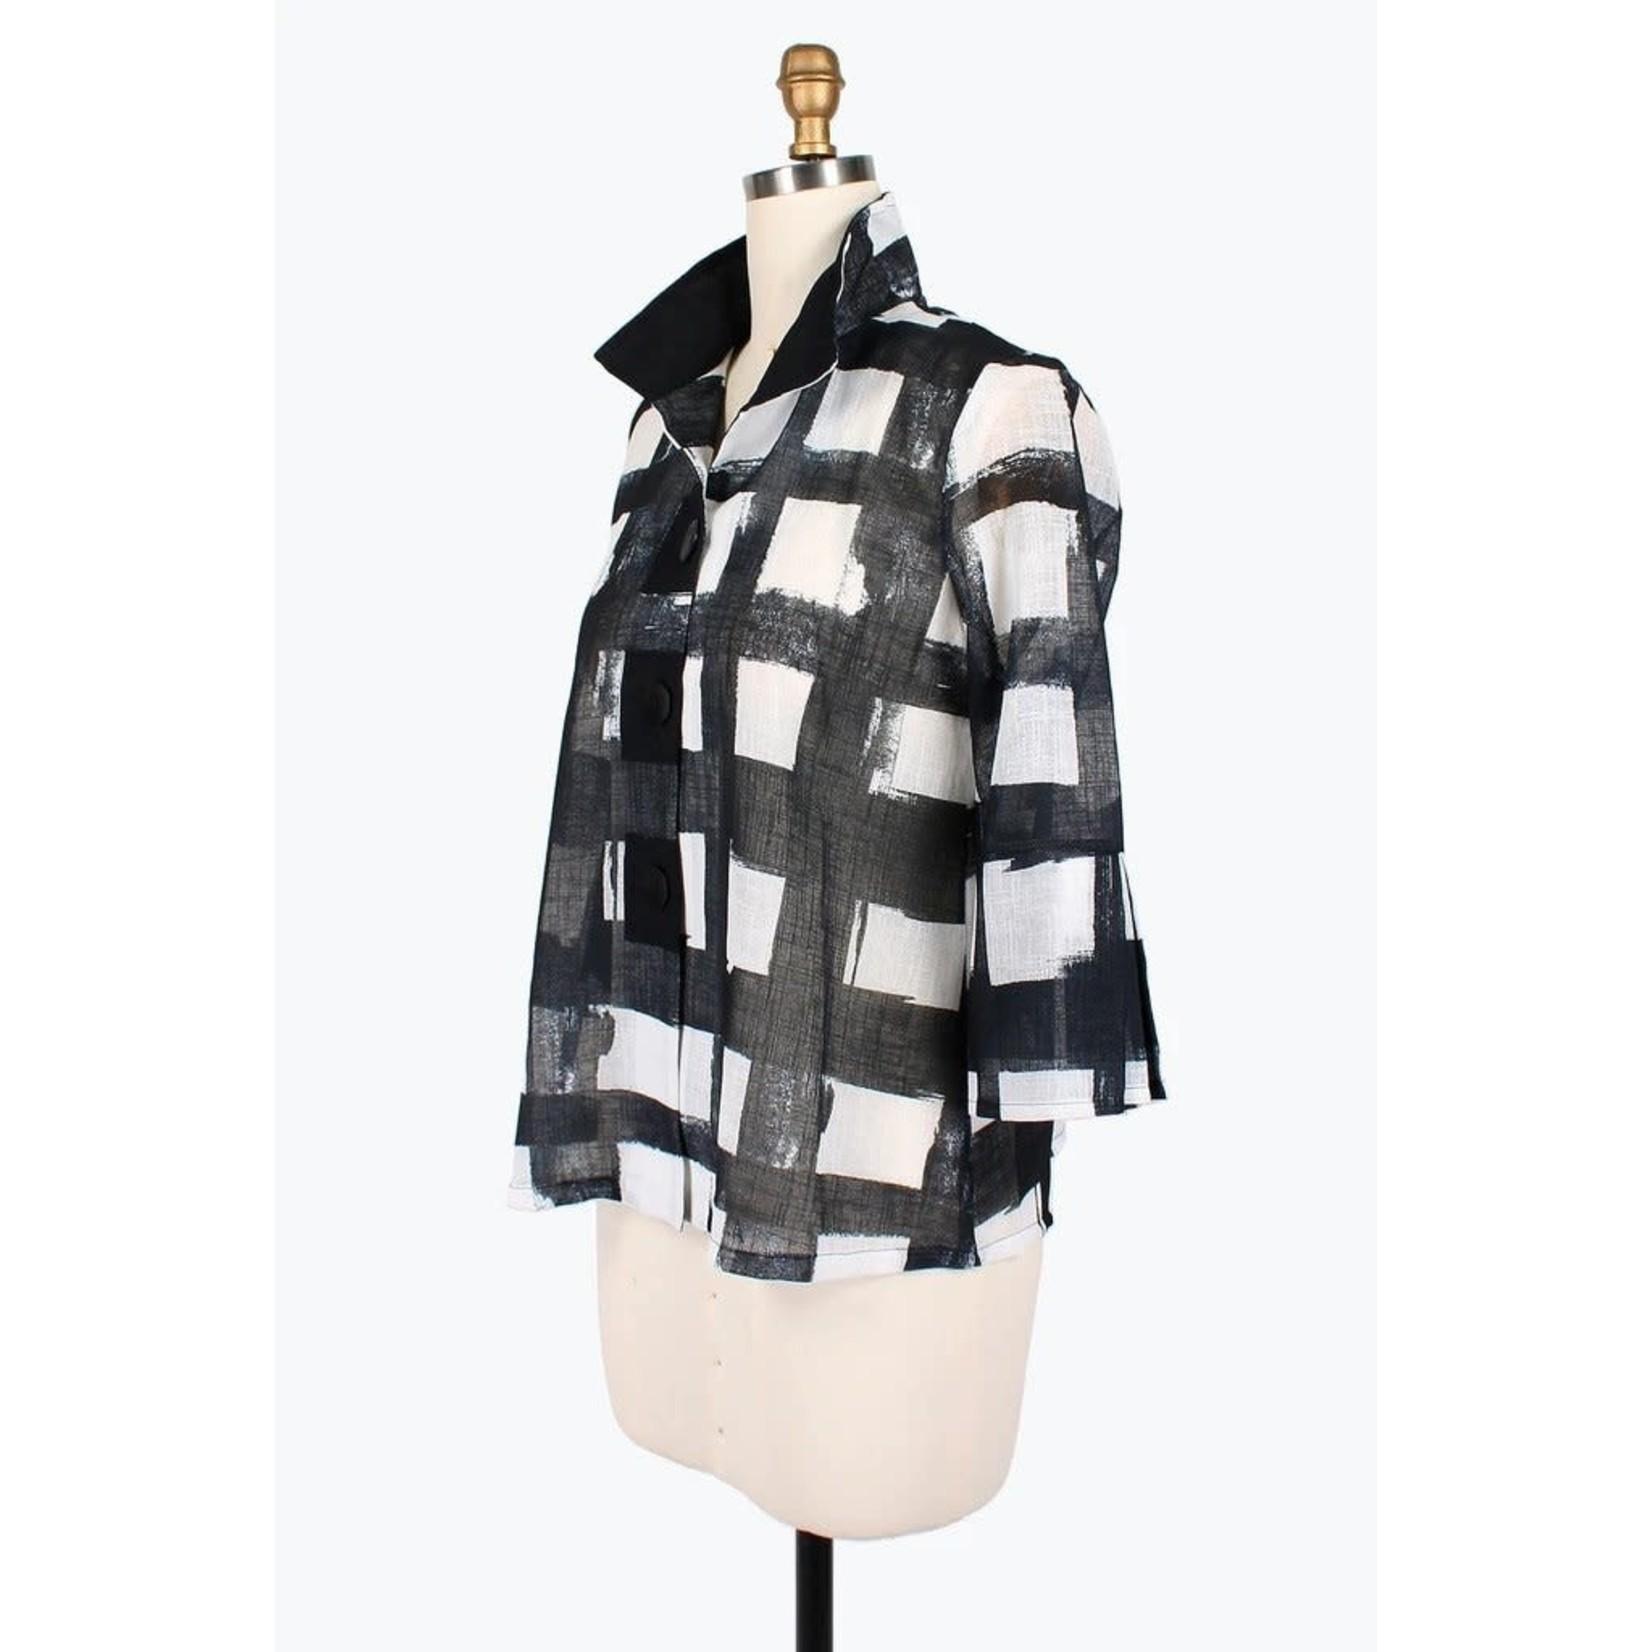 Damee Black & White Checkered Sheer Jacket w/Adjustable Collar